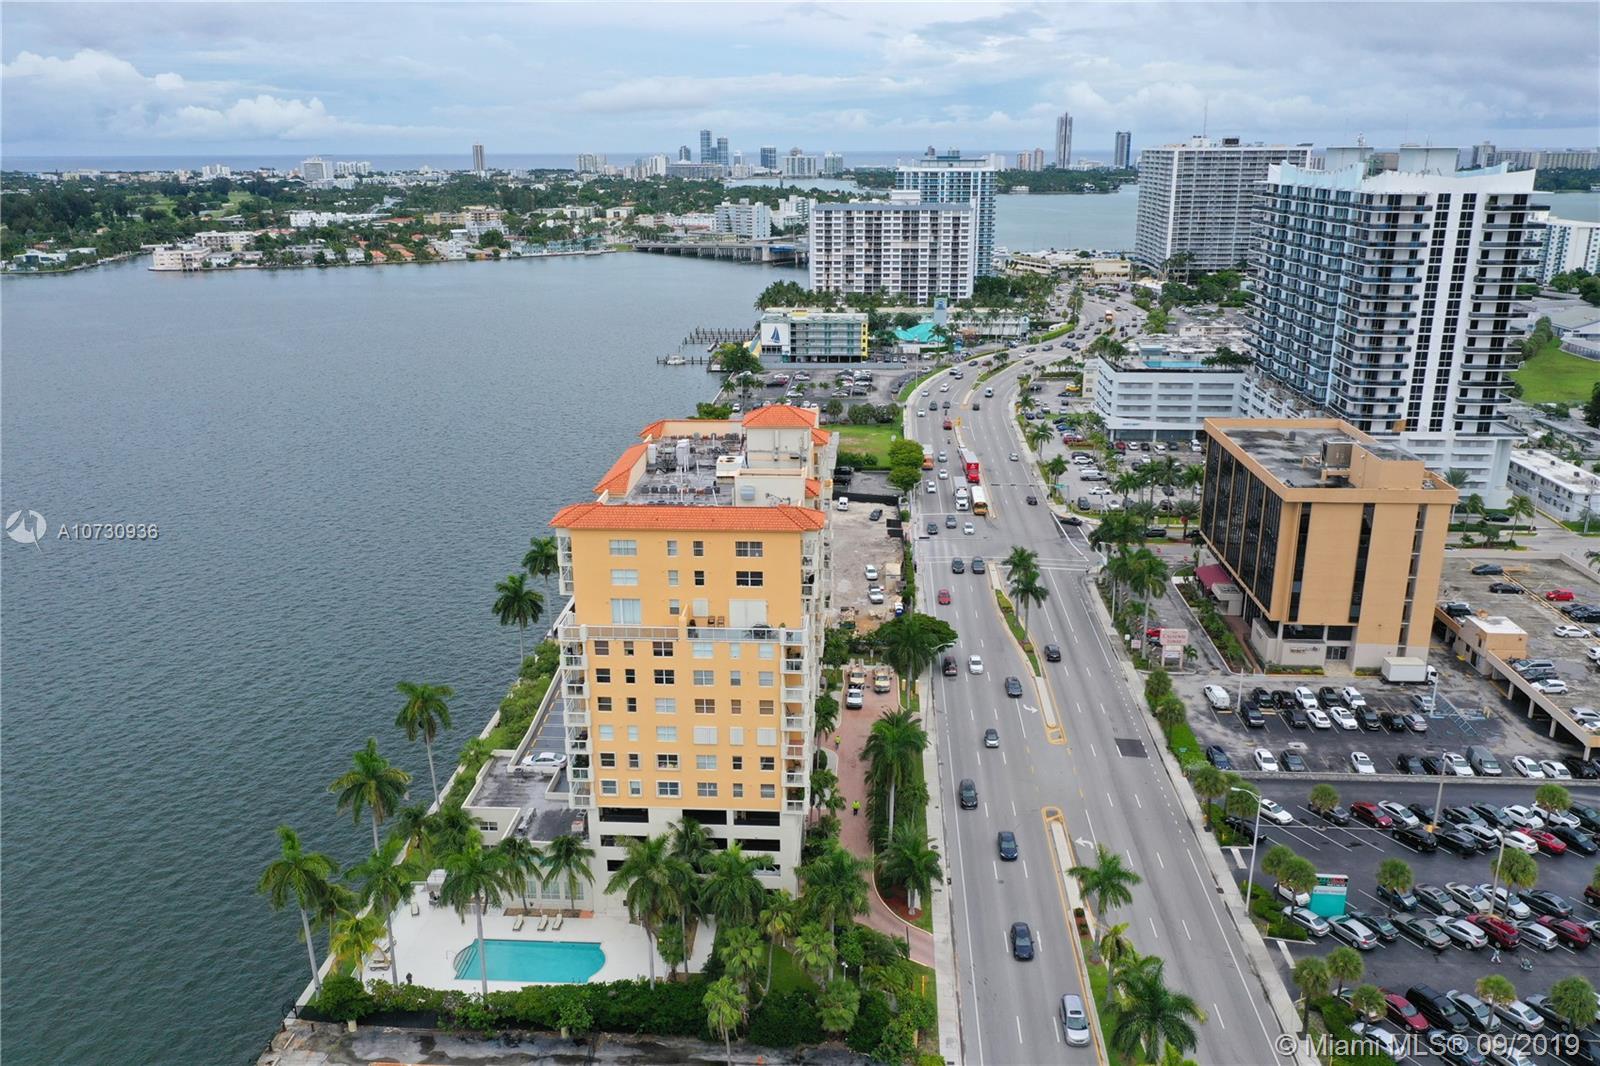 1625 Kennedy Cswy, 908A - North Bay Village, Florida